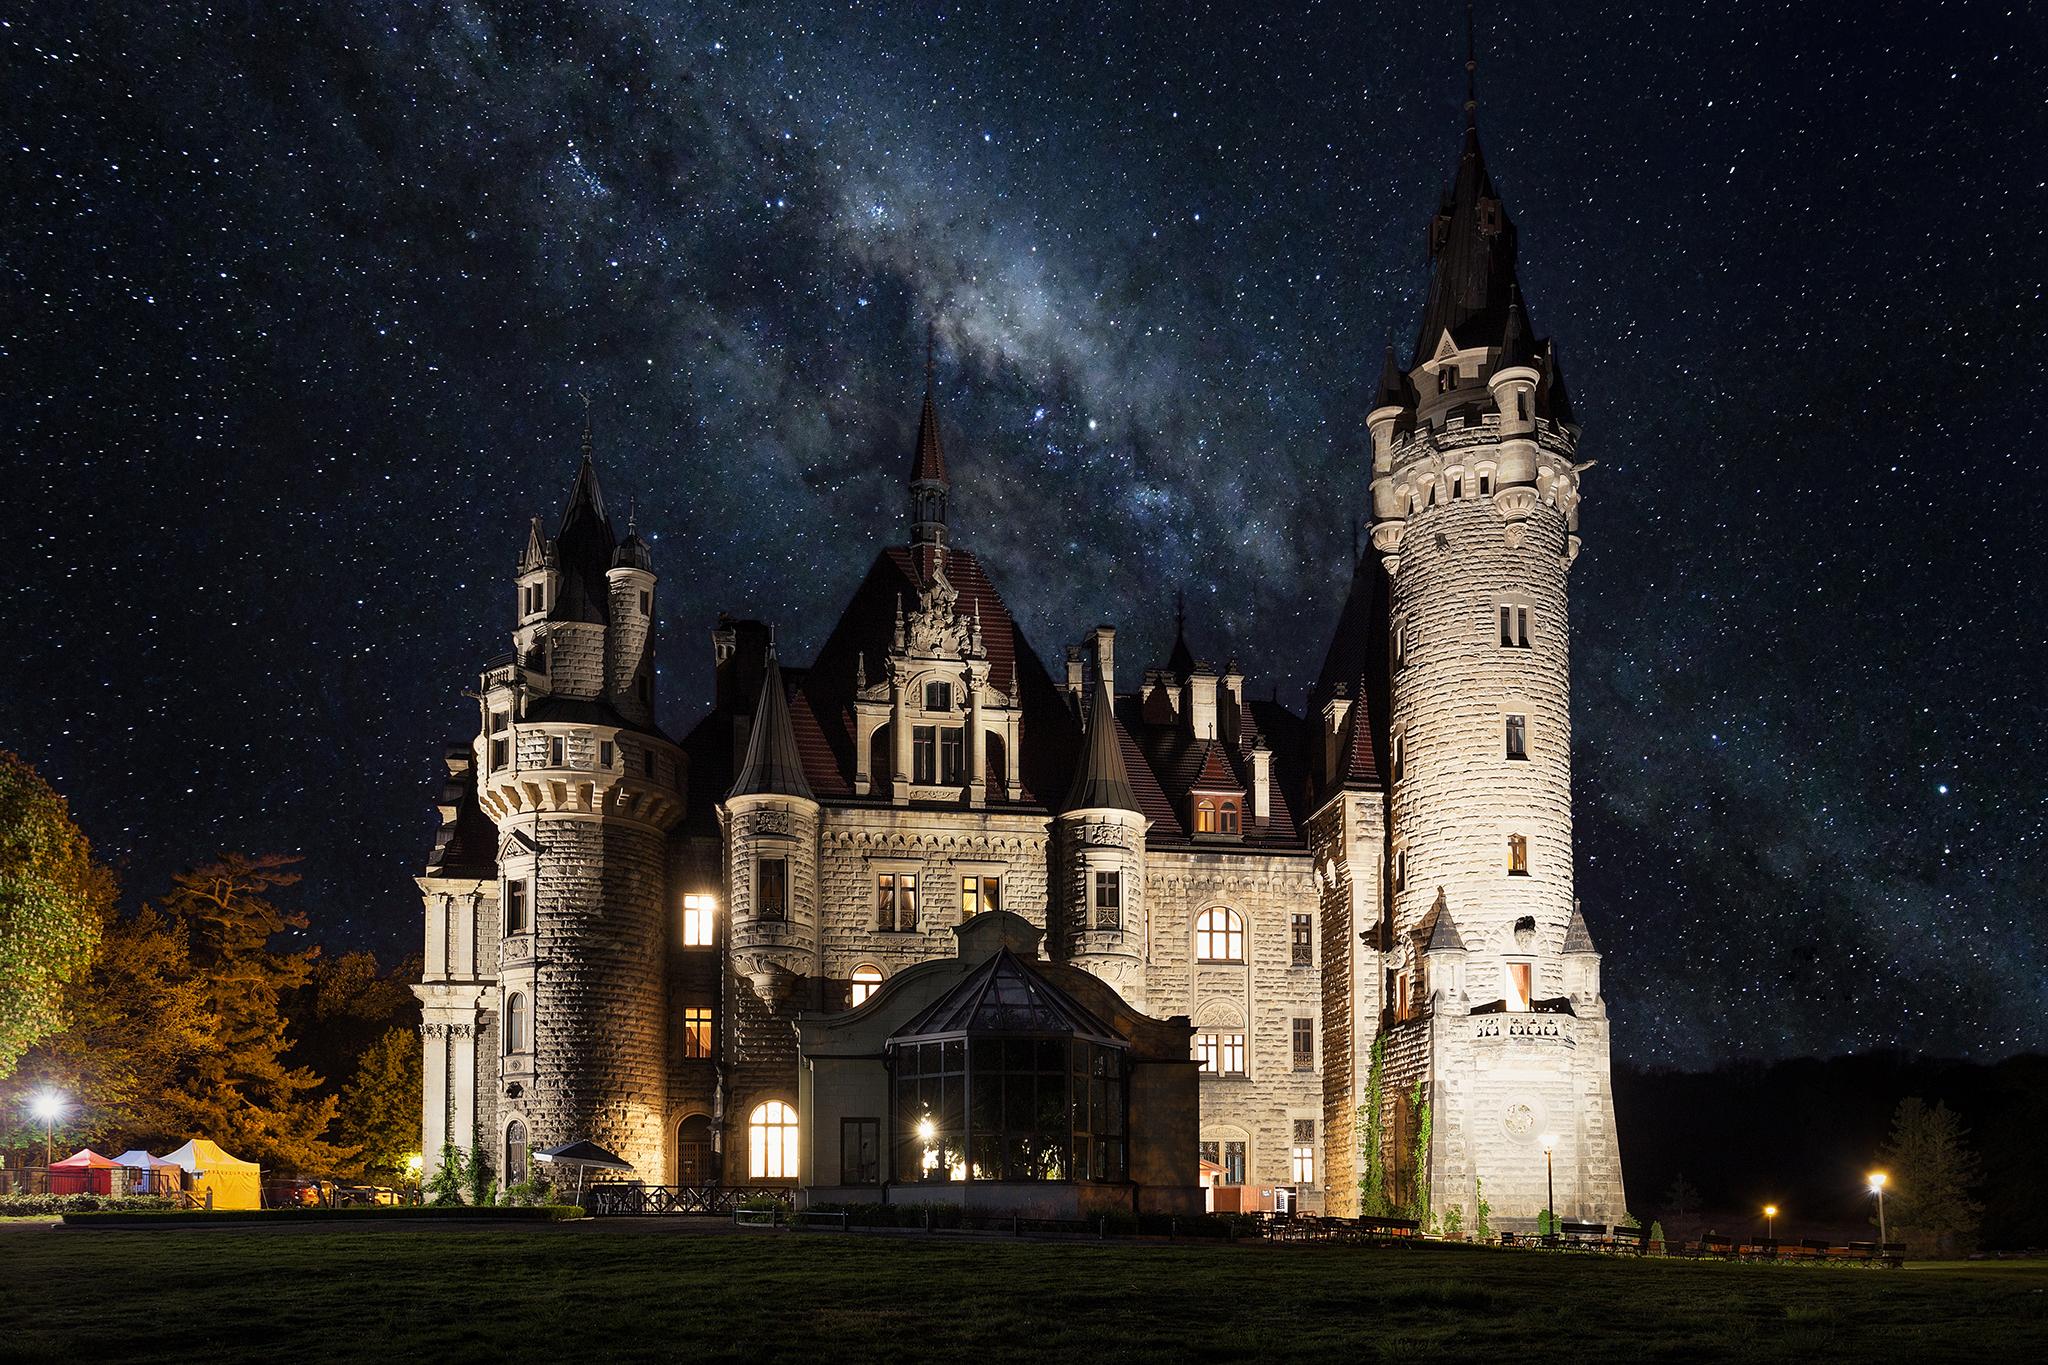 General 2048x1365 architecture castle medieval Pawel Olejniczak night Milky Way stars field lights Poland